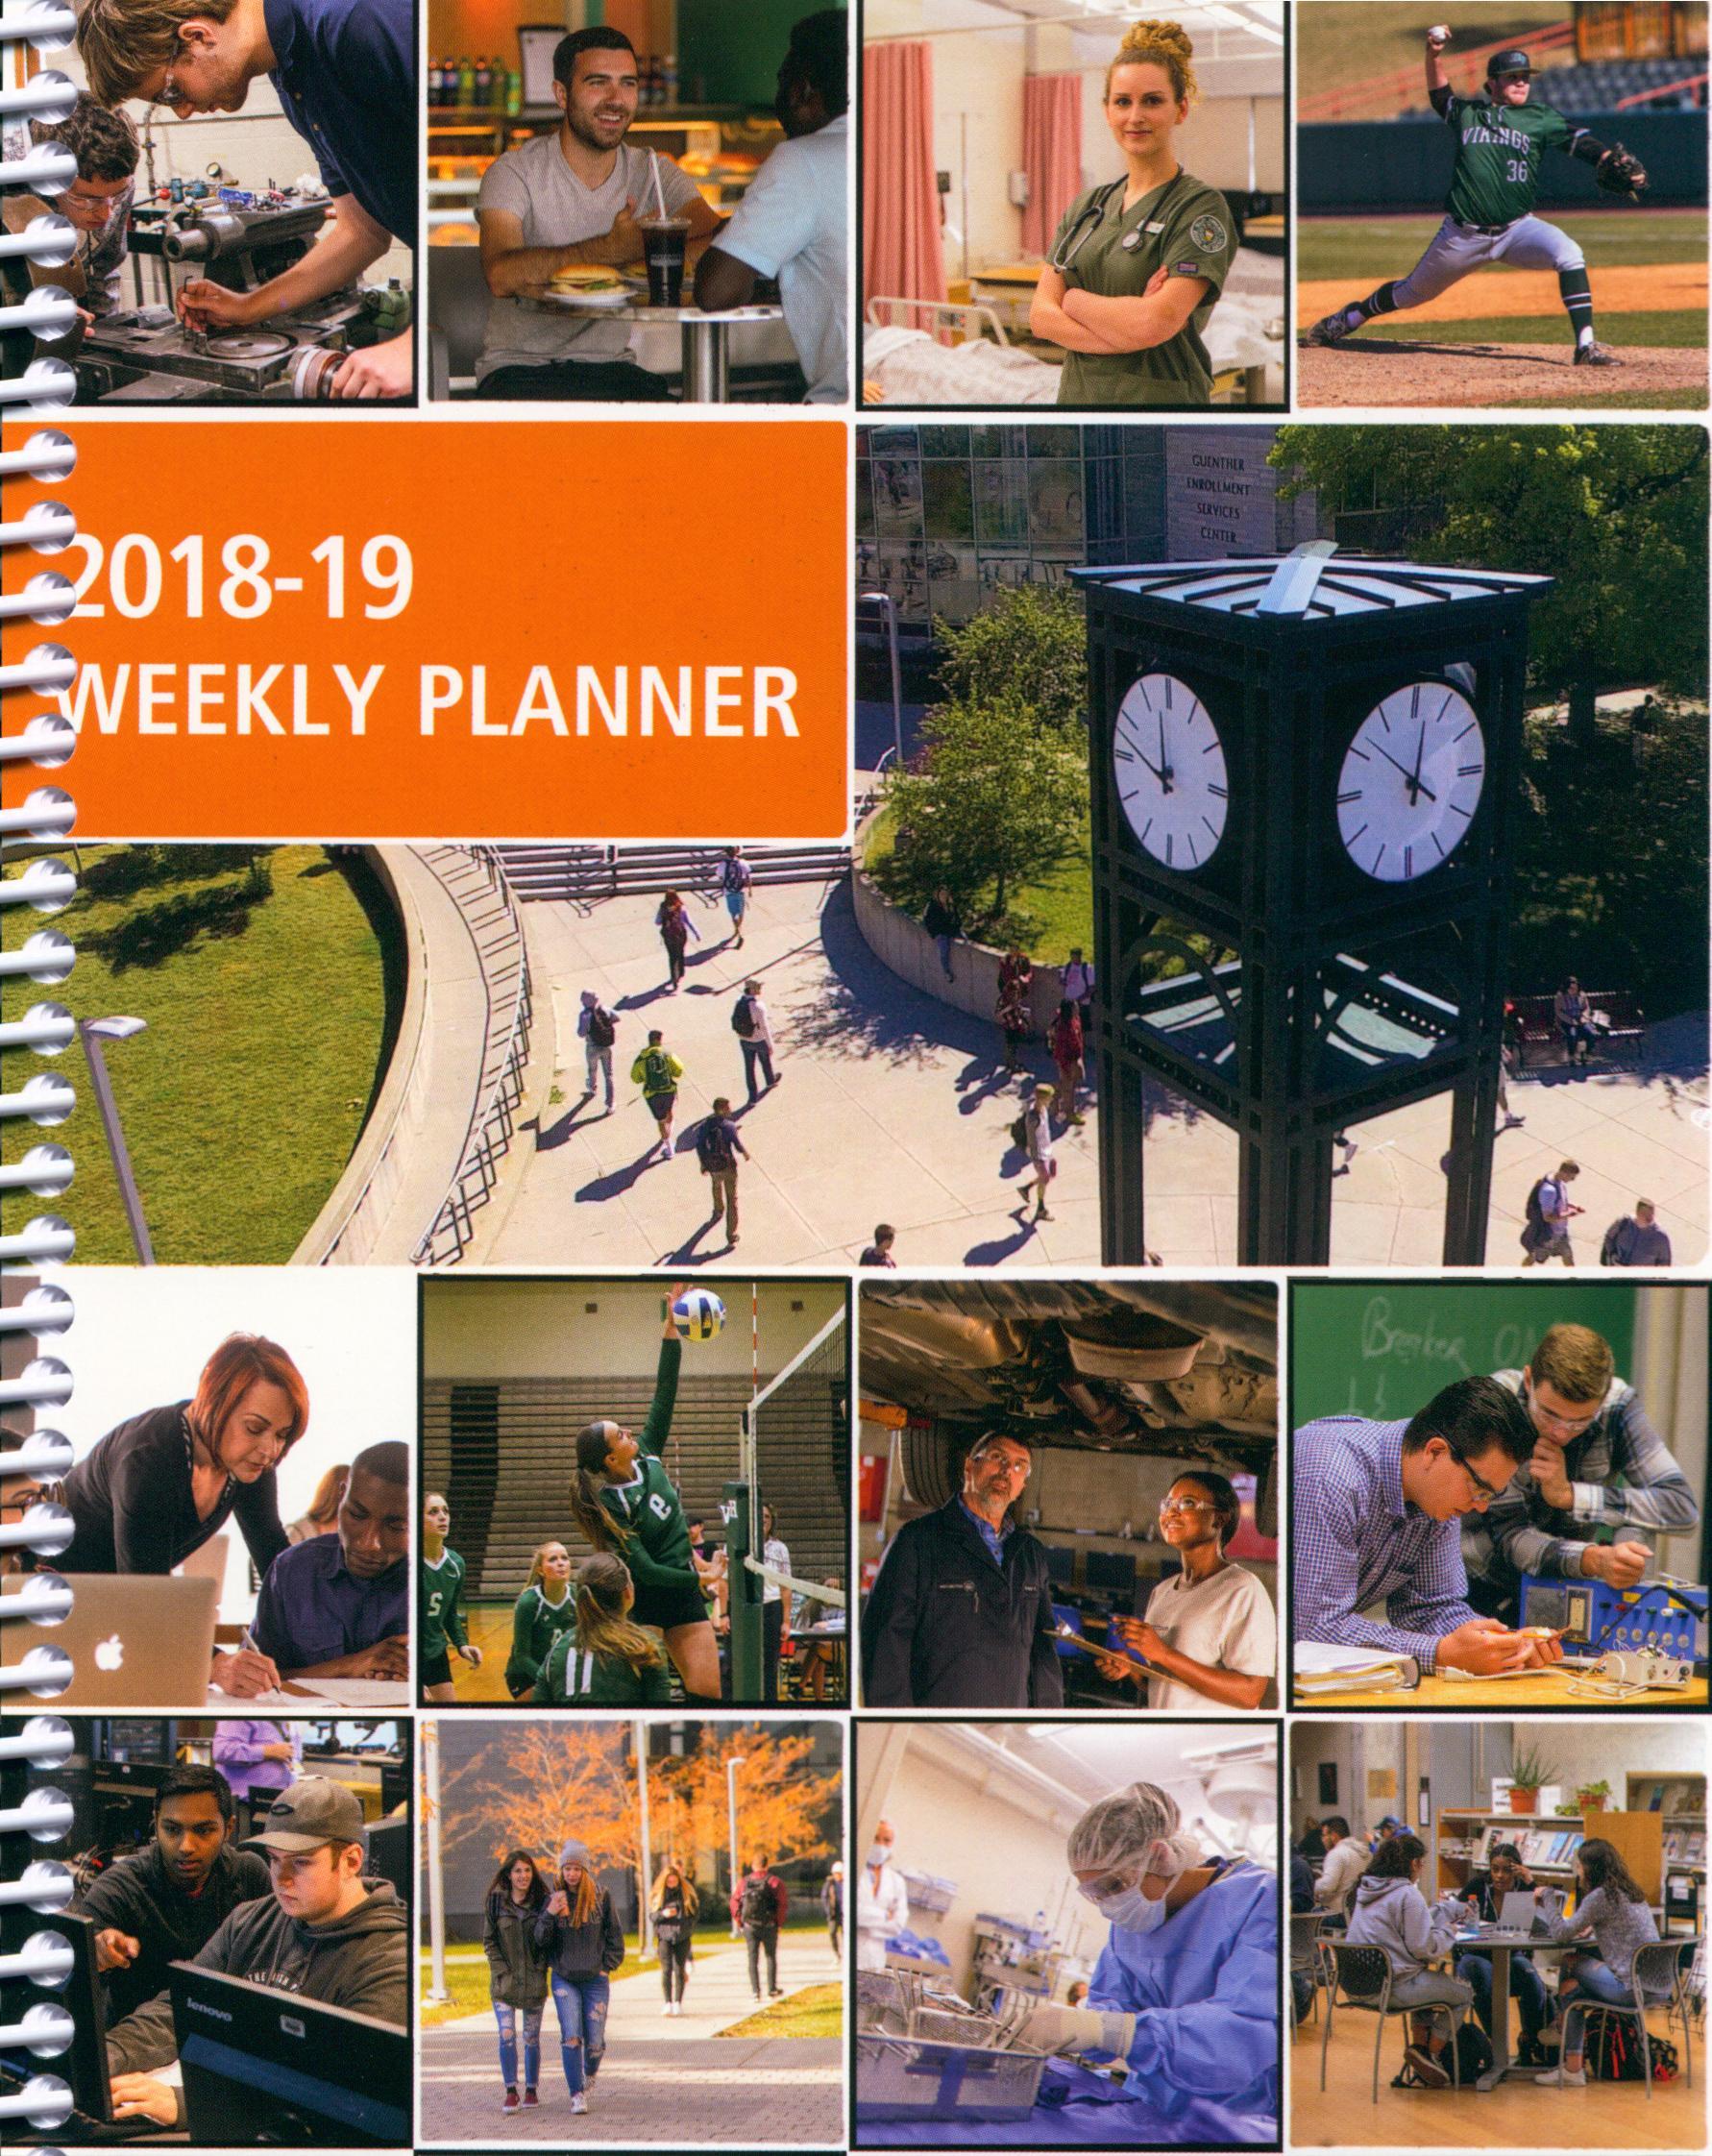 HVCC Student Handbook, 2018-2019